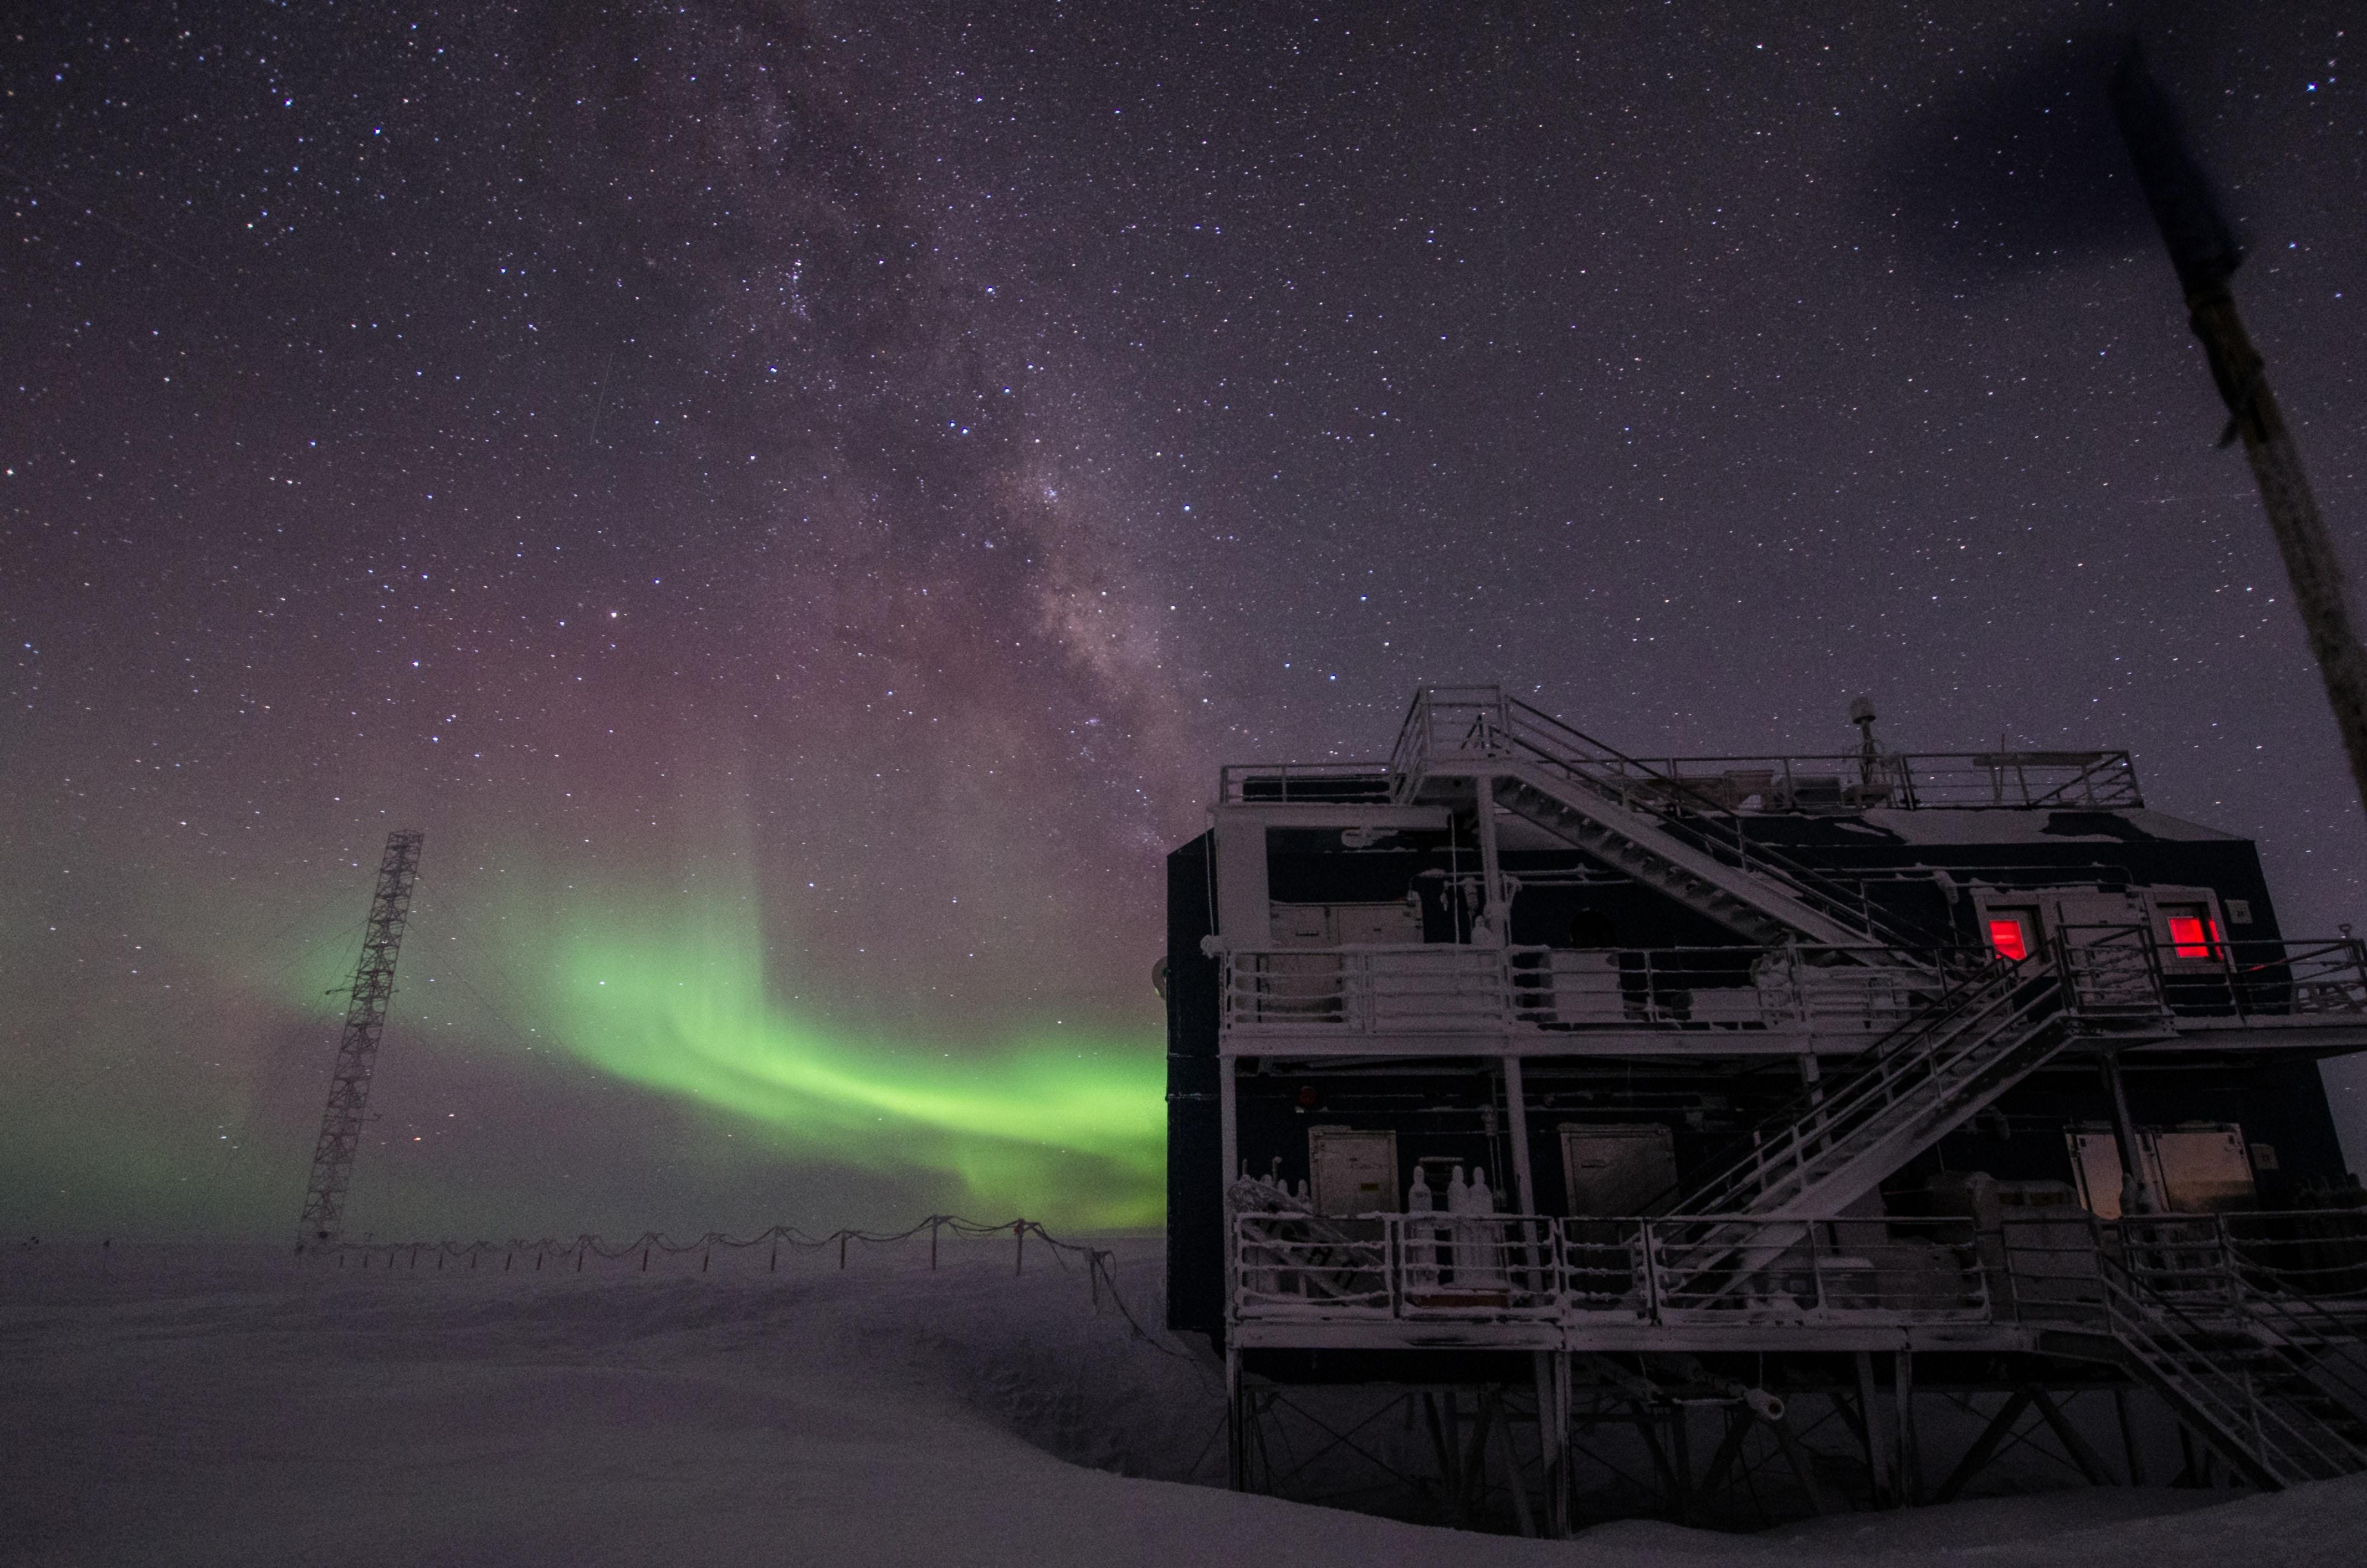 antarctica at night